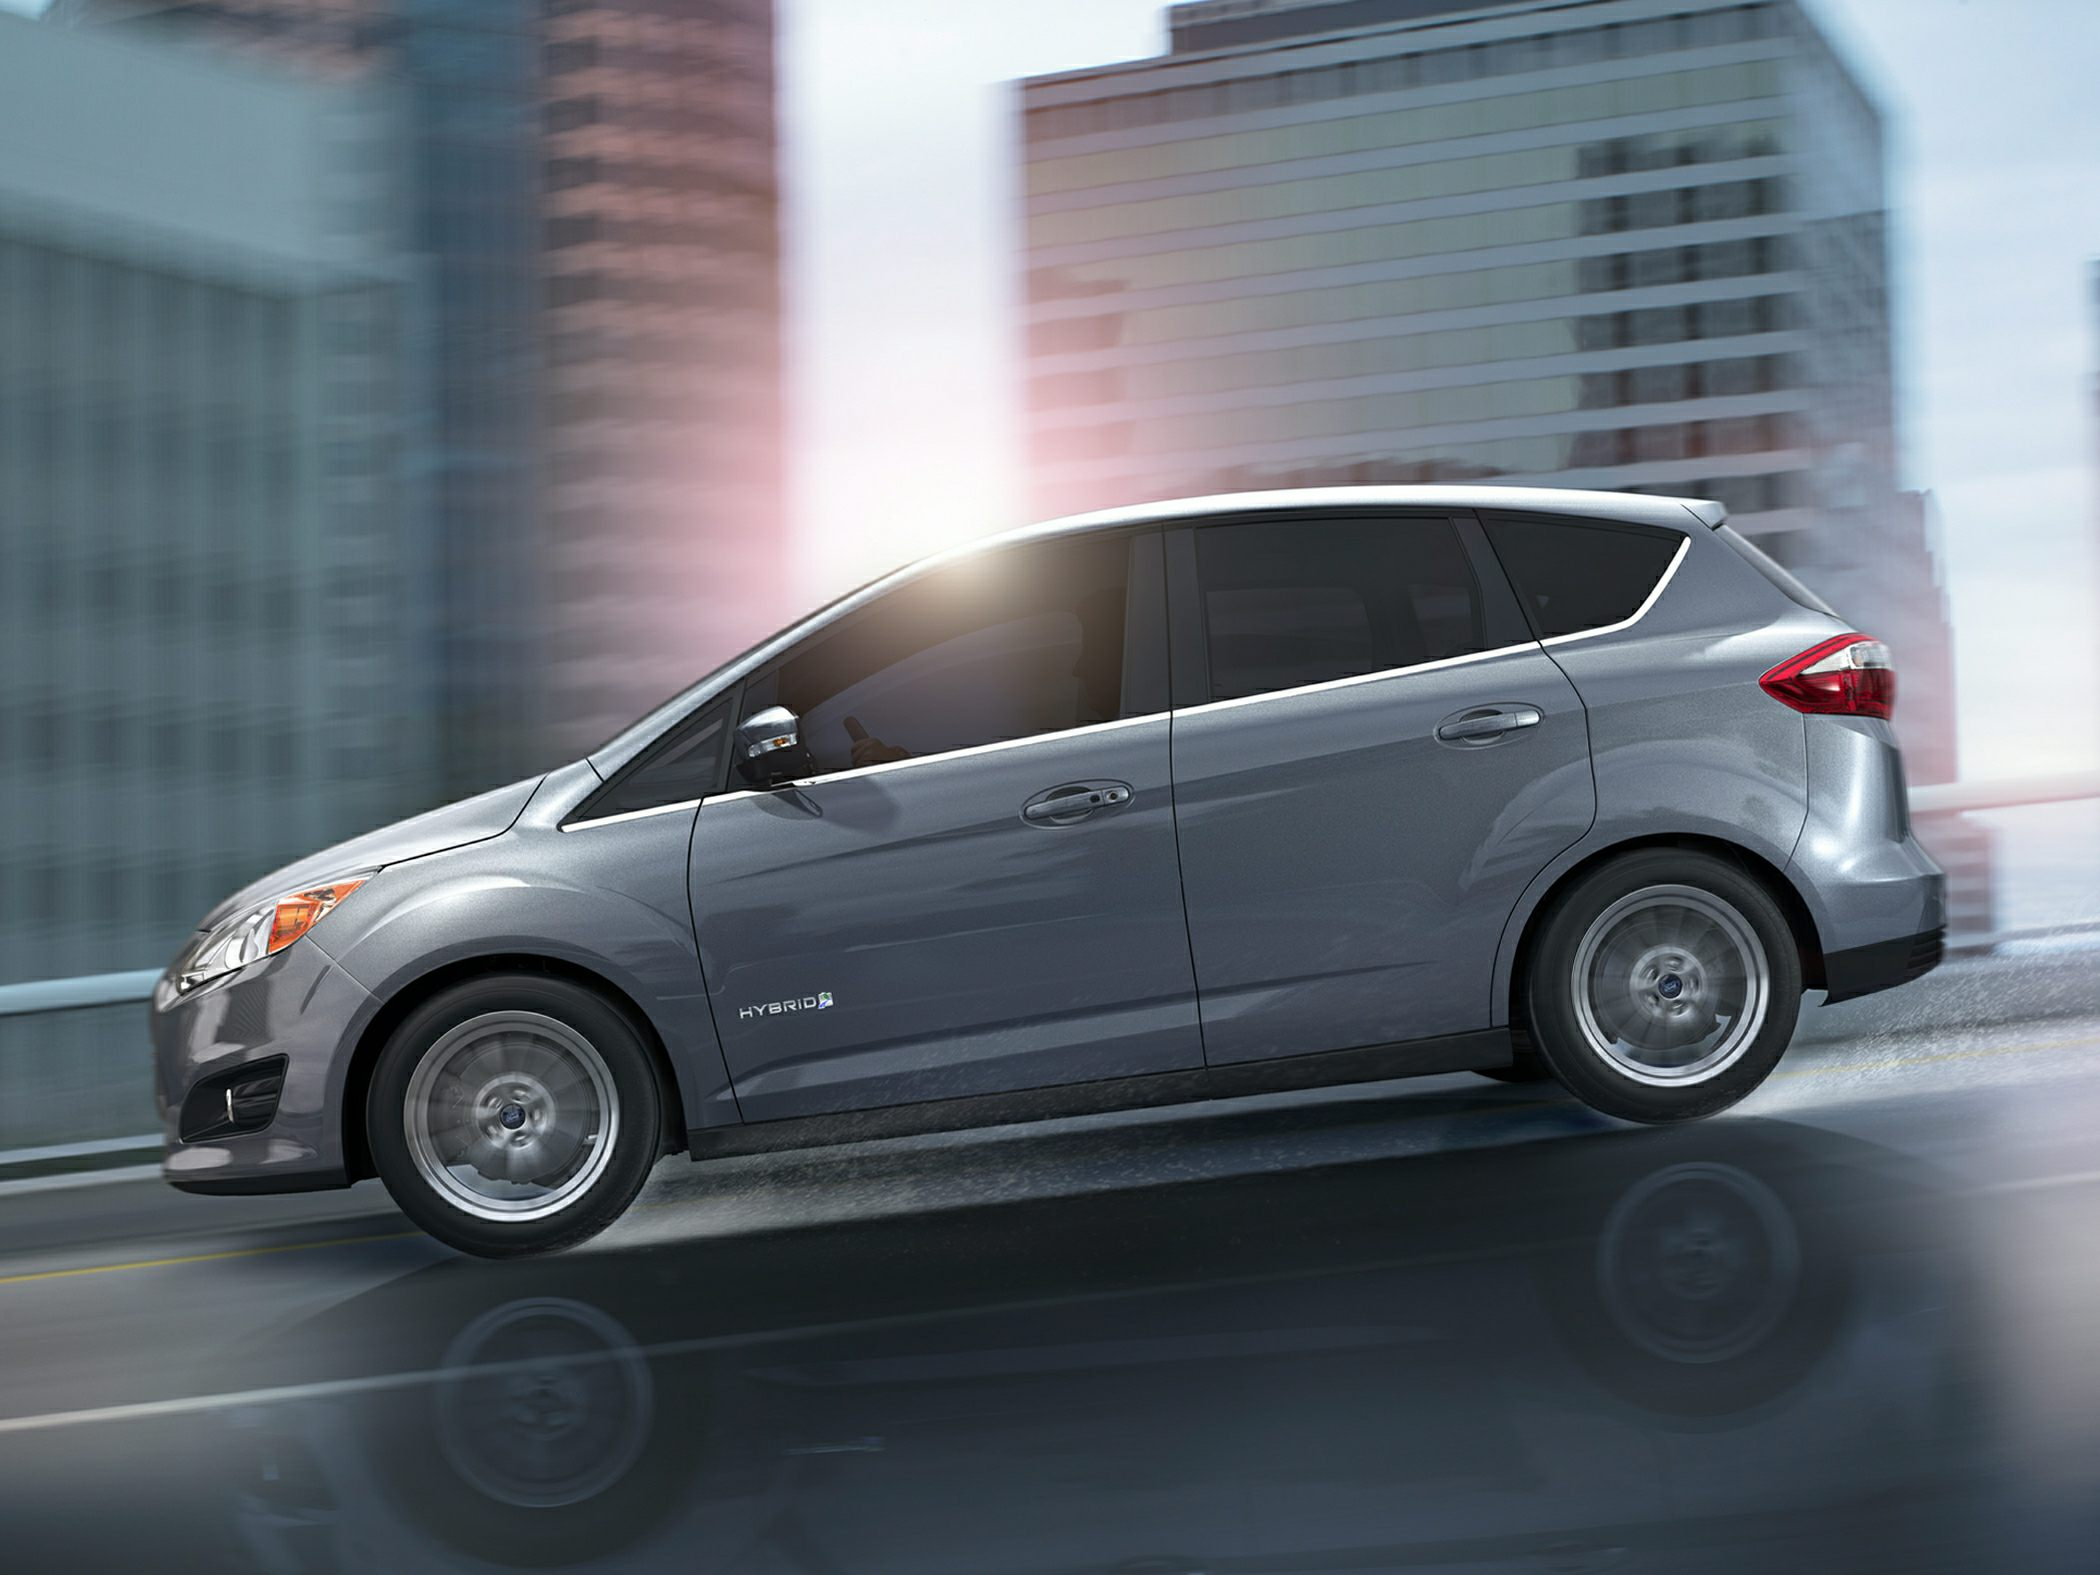 2014 Ford C-Max Hybrid Glam